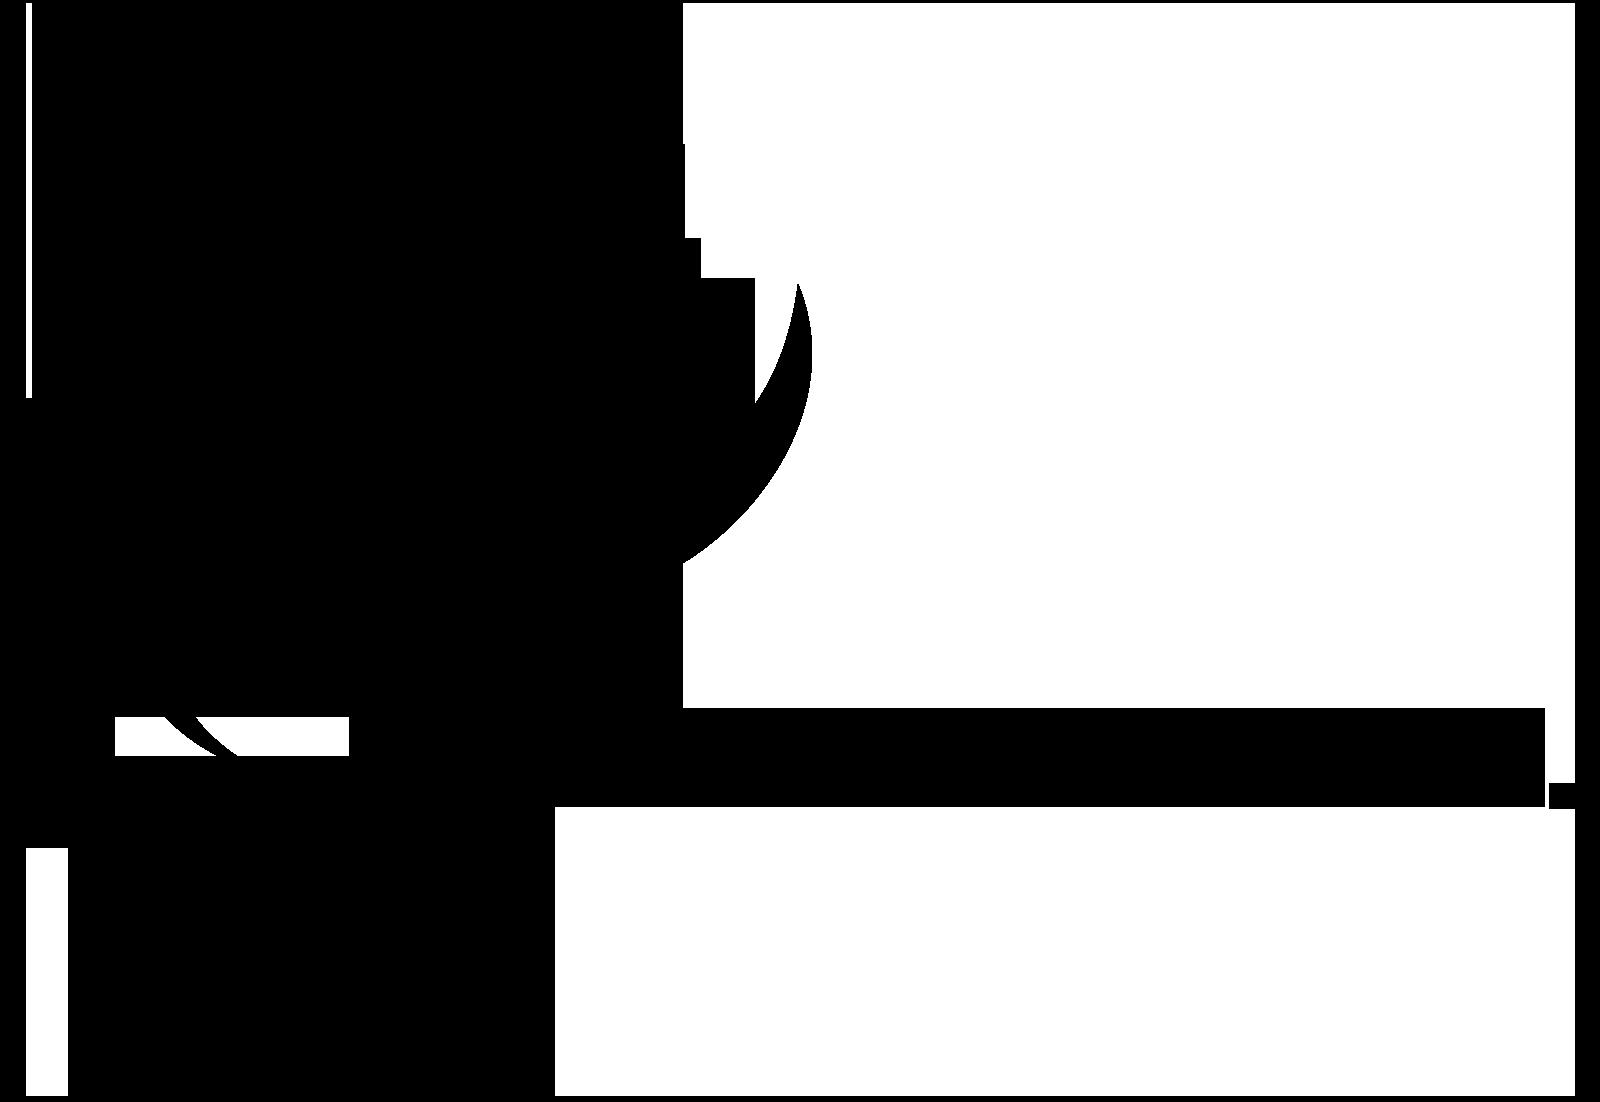 LTR_Logo Final.png